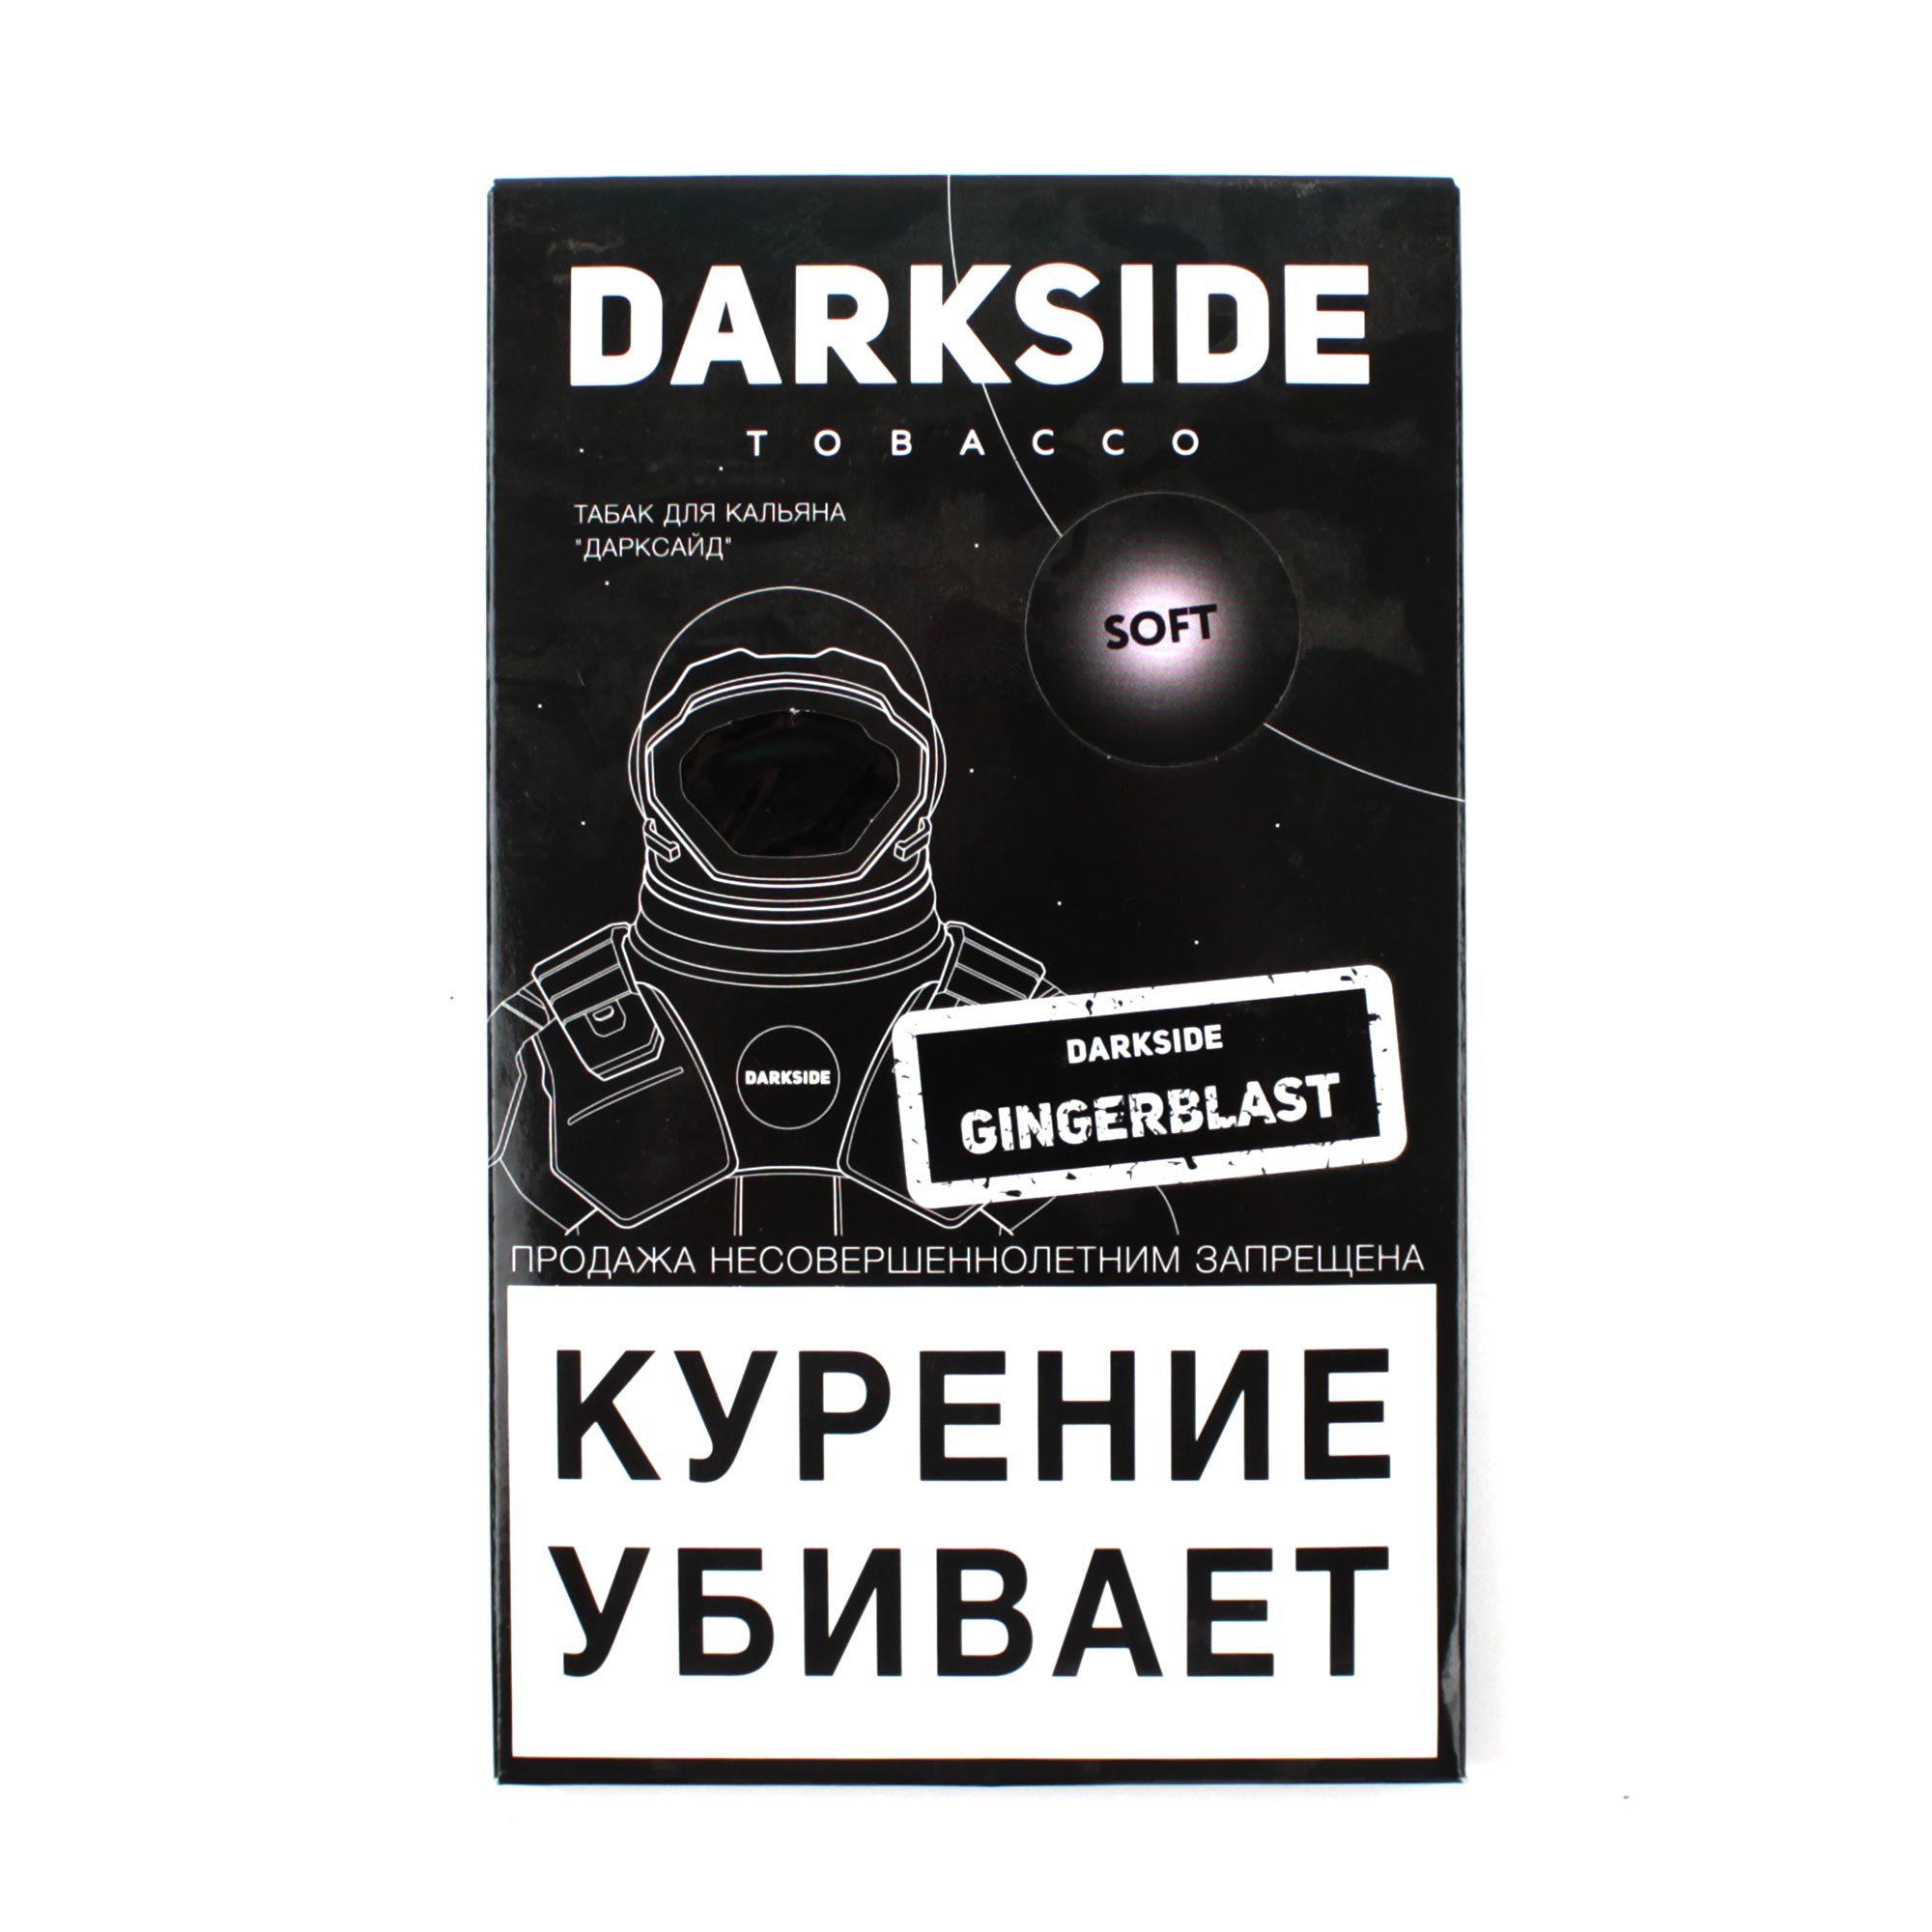 Табак для кальяна Dark Side Soft 100 гр Gingerblast